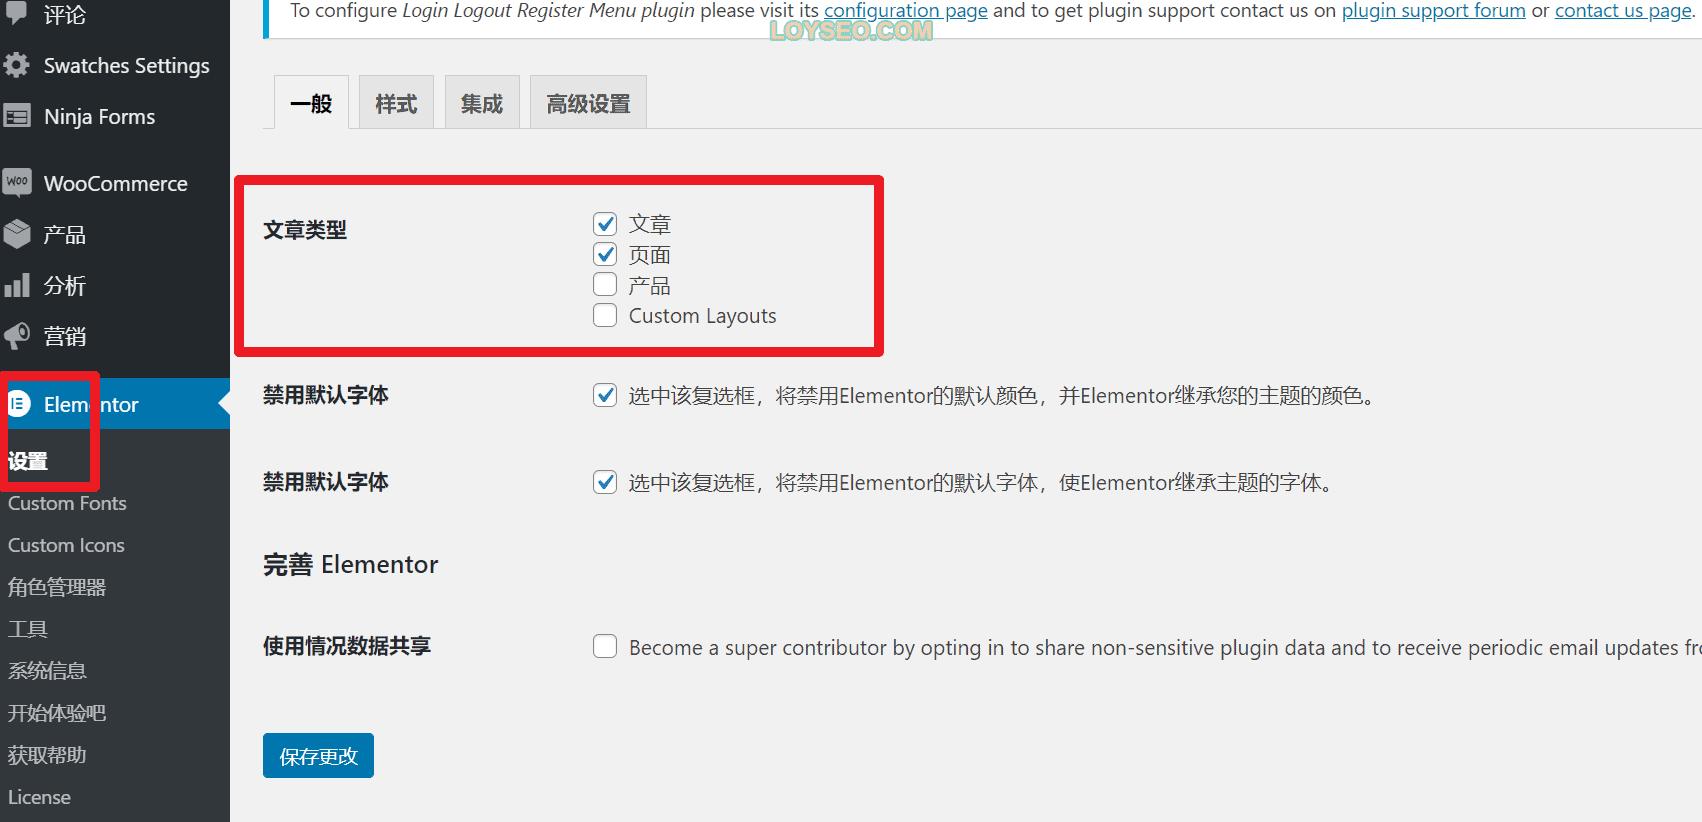 image 41 - 使用Elementor建站的常见问题答疑